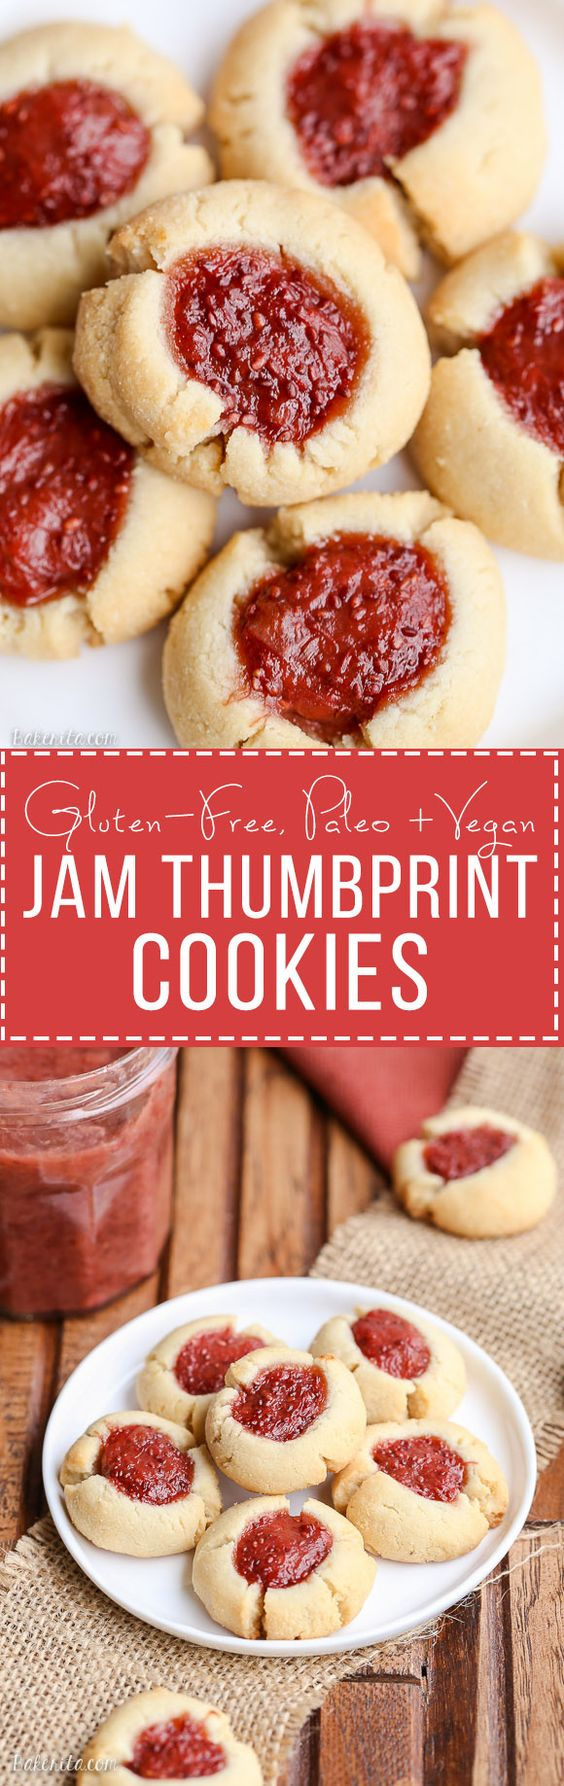 jam-thumbprint-cookies-paleo-vegan-gluten-free